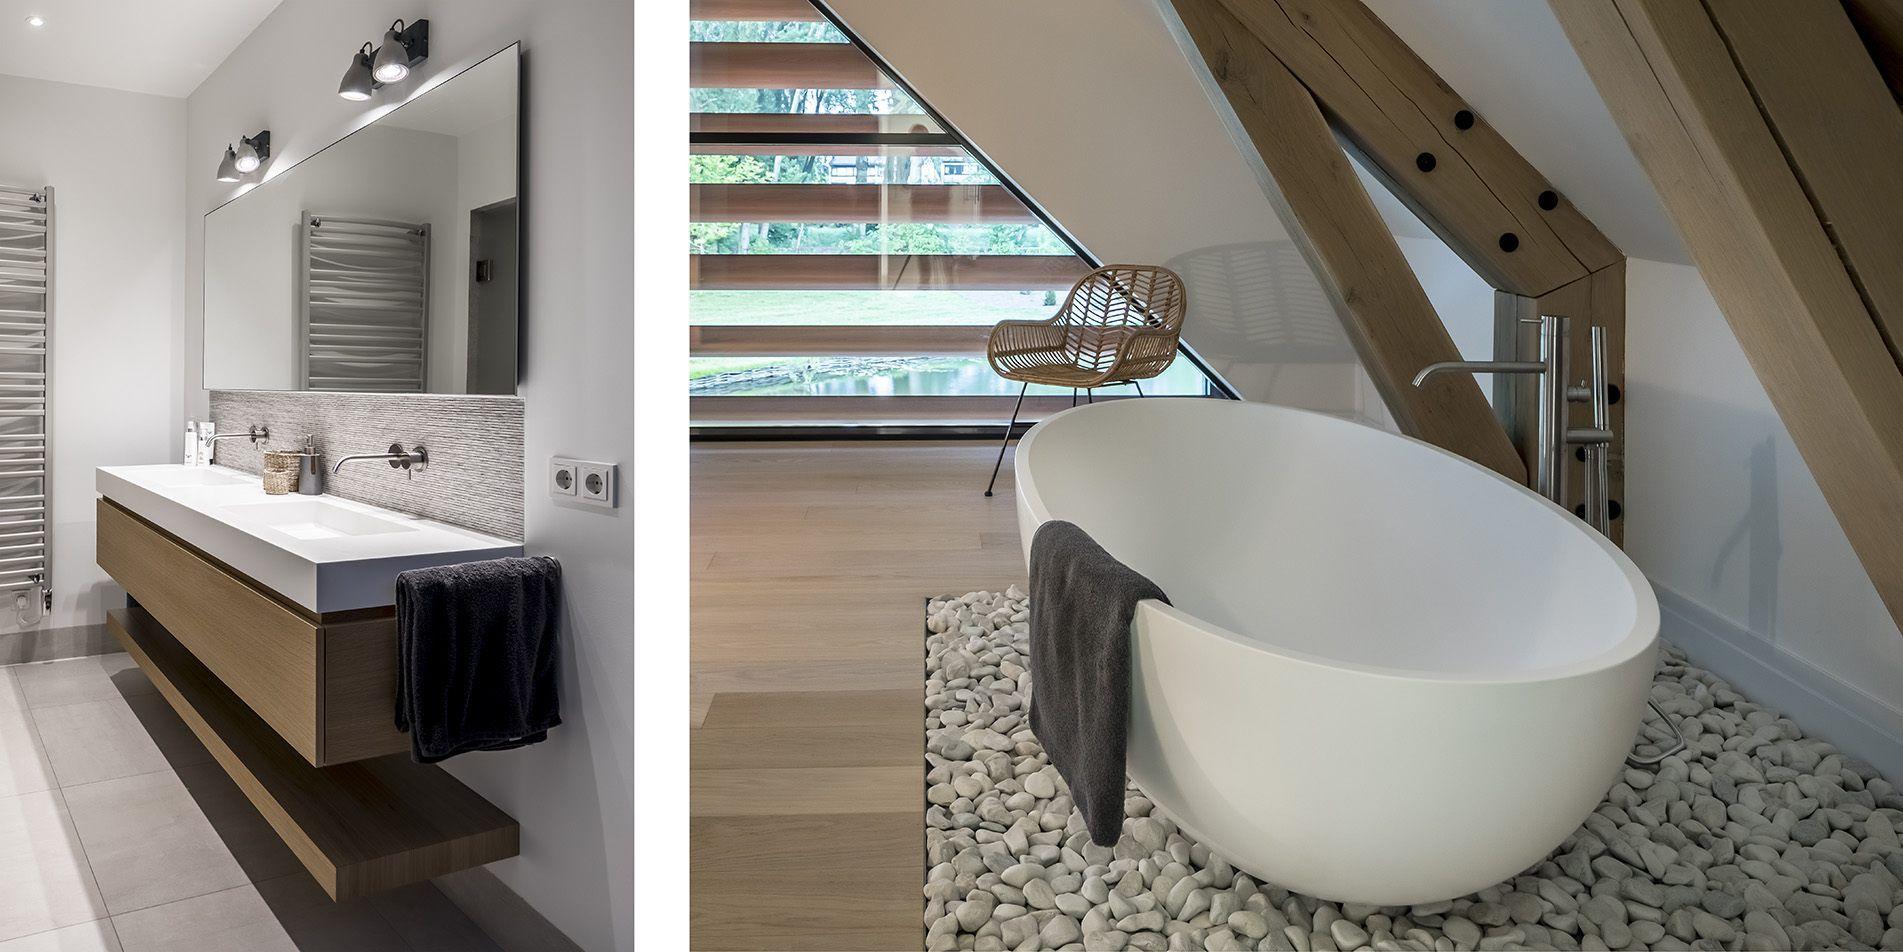 Design Wandverlichting Badkamer : Badkamermeubels van b dutch selecteer uit vele opties badmeubels